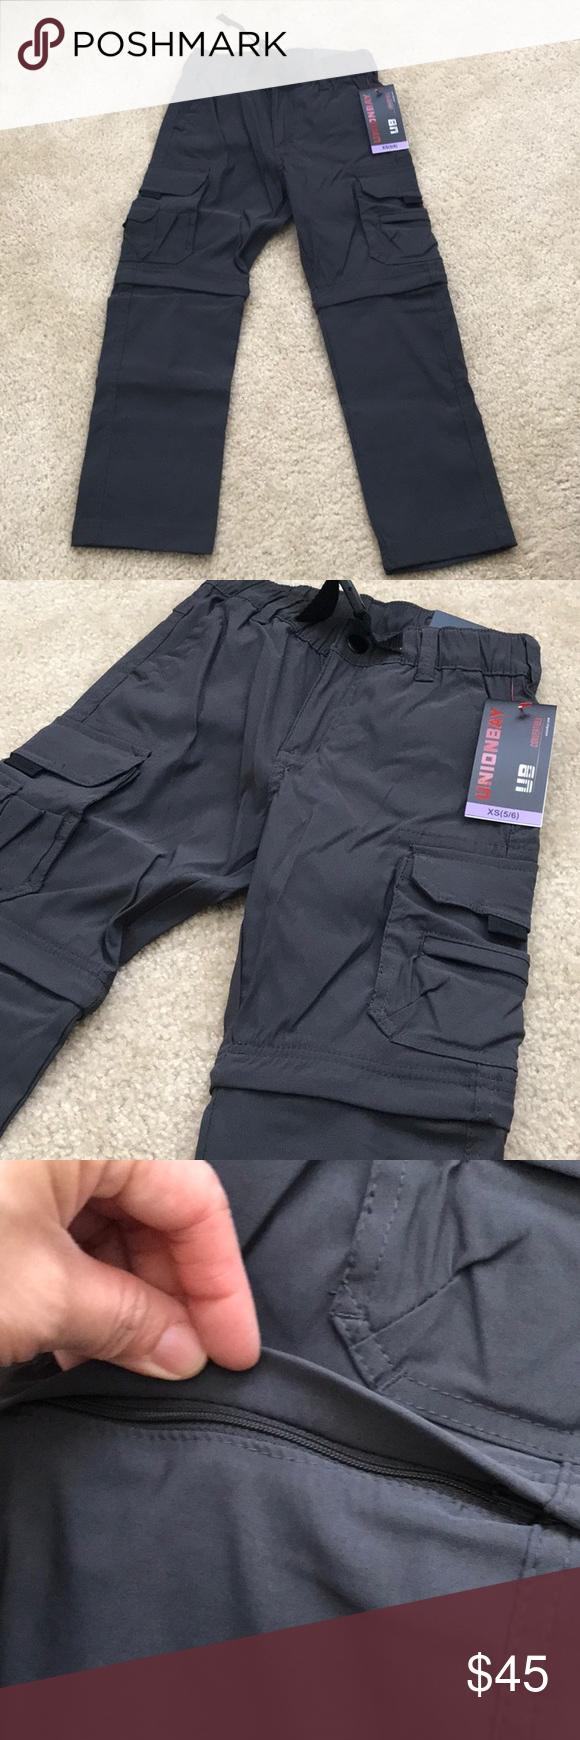 6 NEW! UNIONBAY Boys Convertible Pants into Shorts Charcoal Grey Size XSmall 5